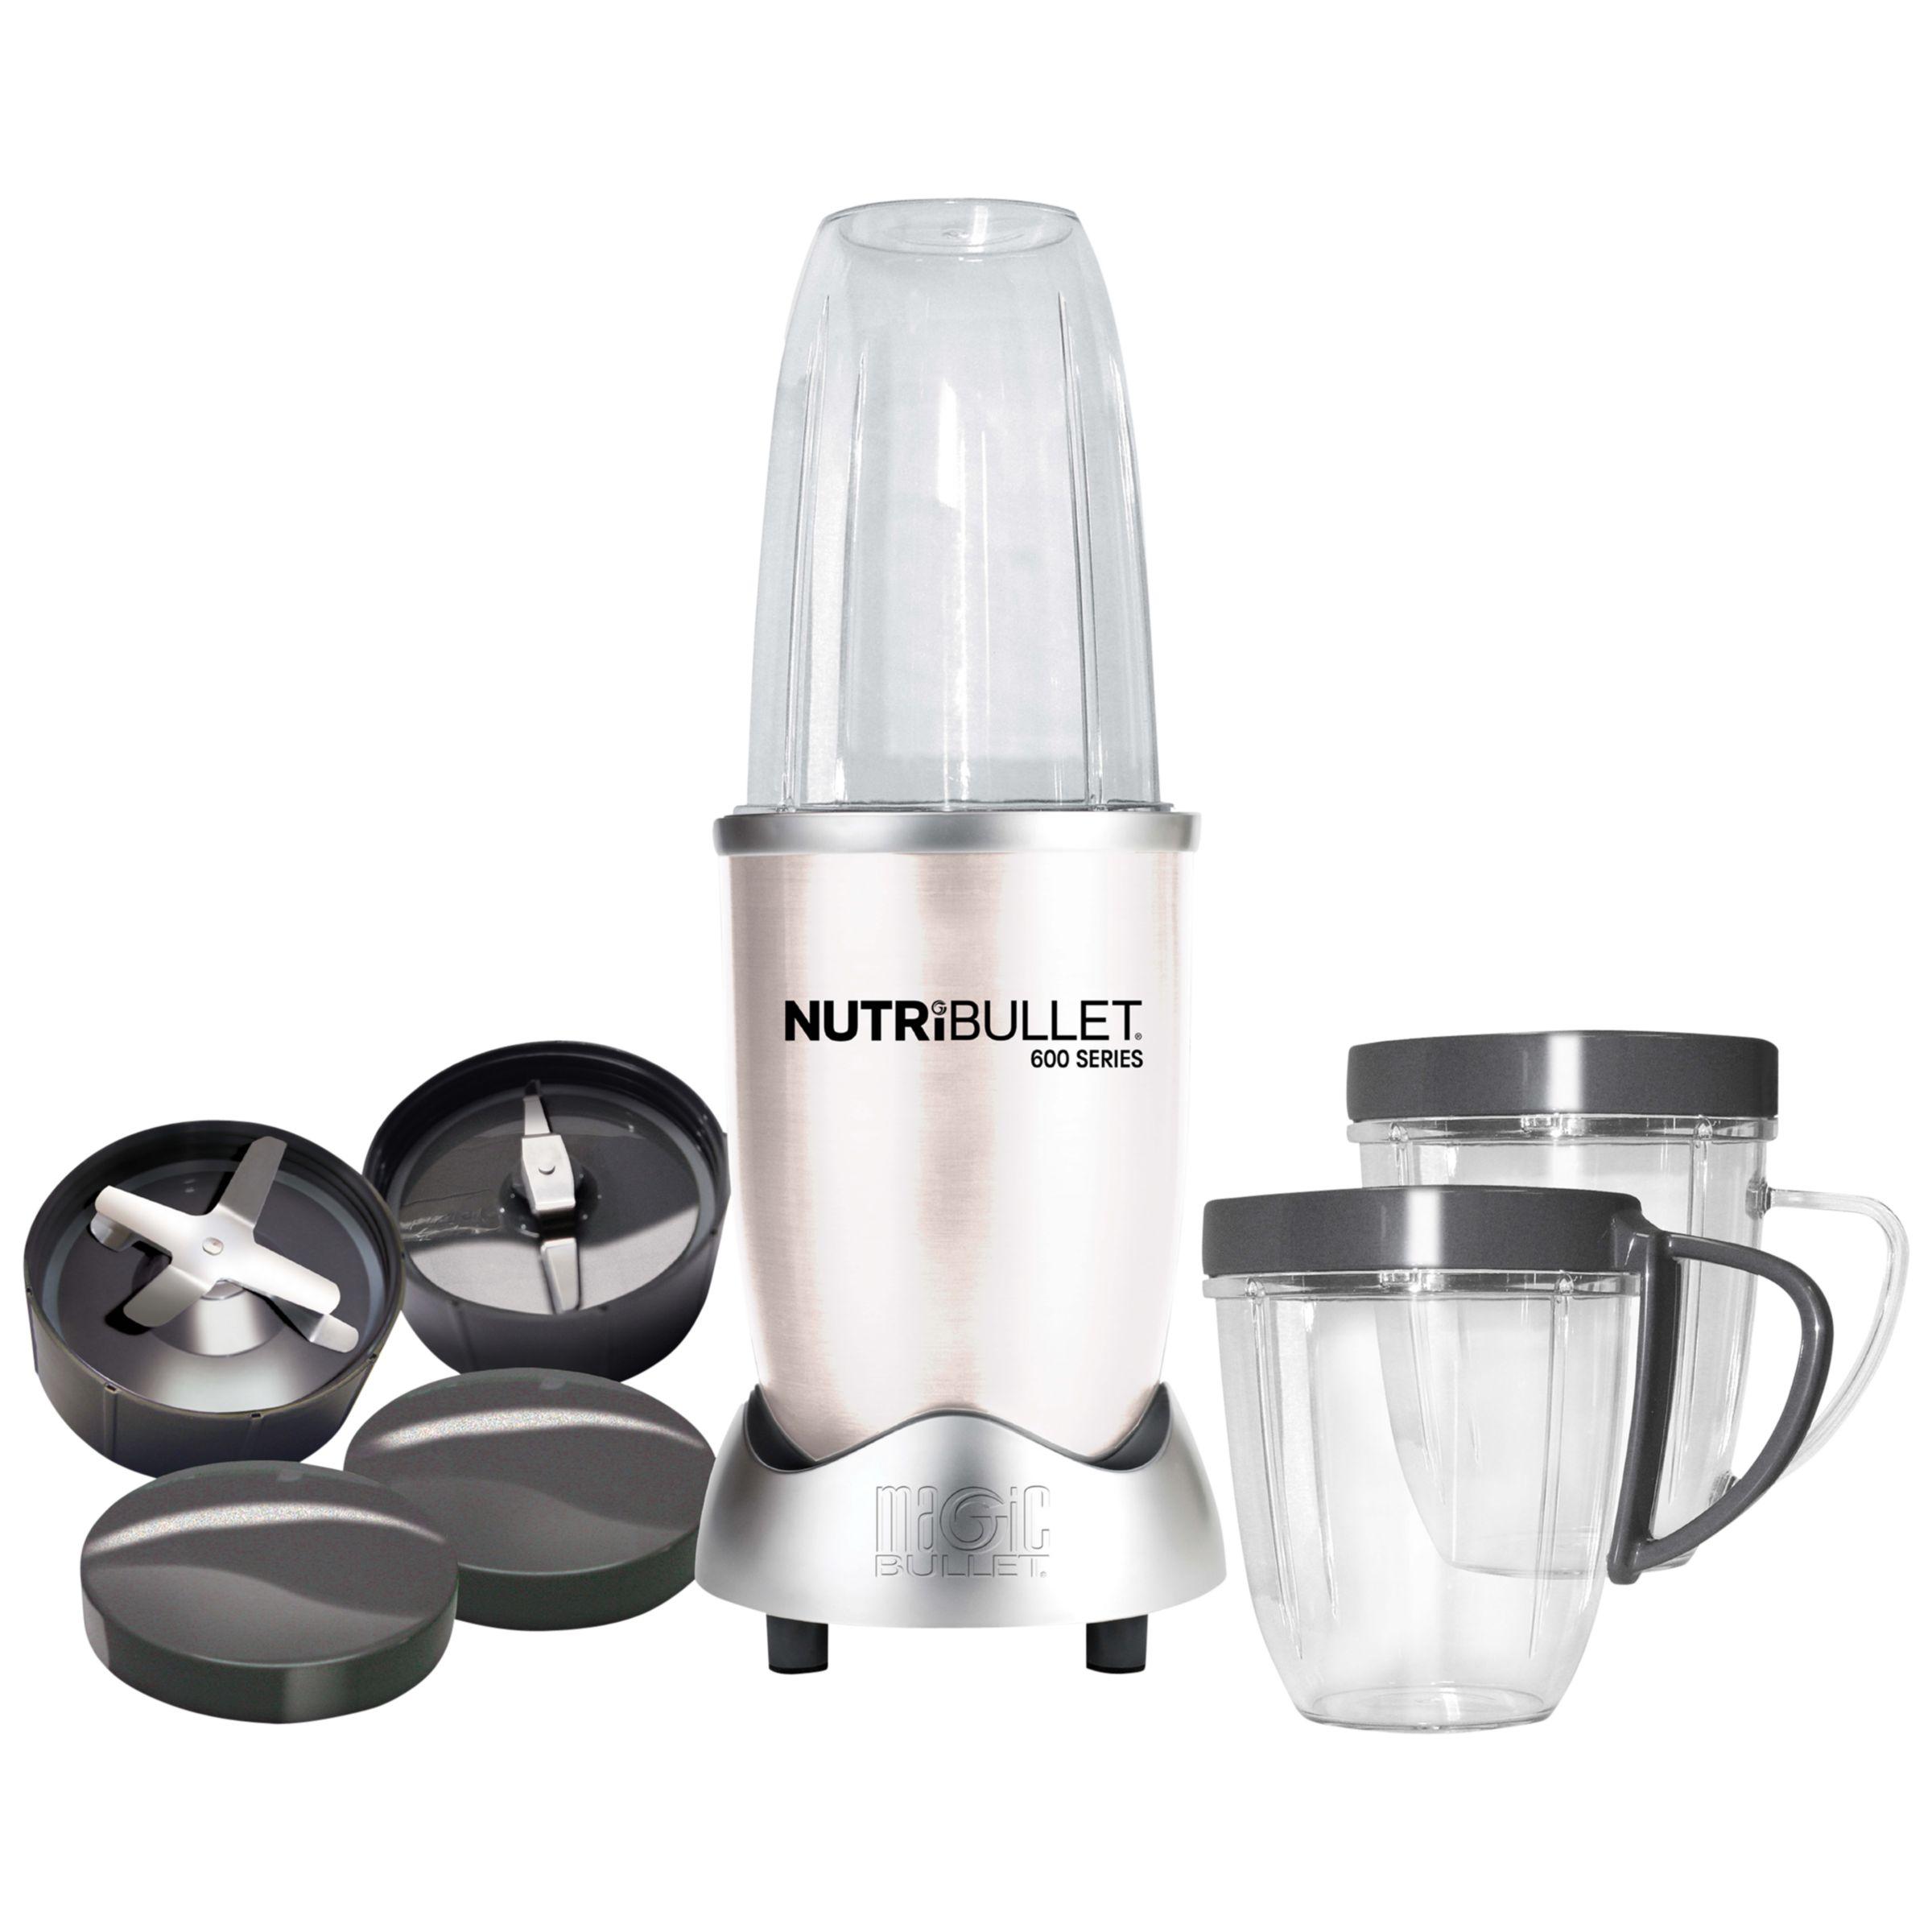 NutriBullet 12 Piece 600 Series Juicer Blender, White at